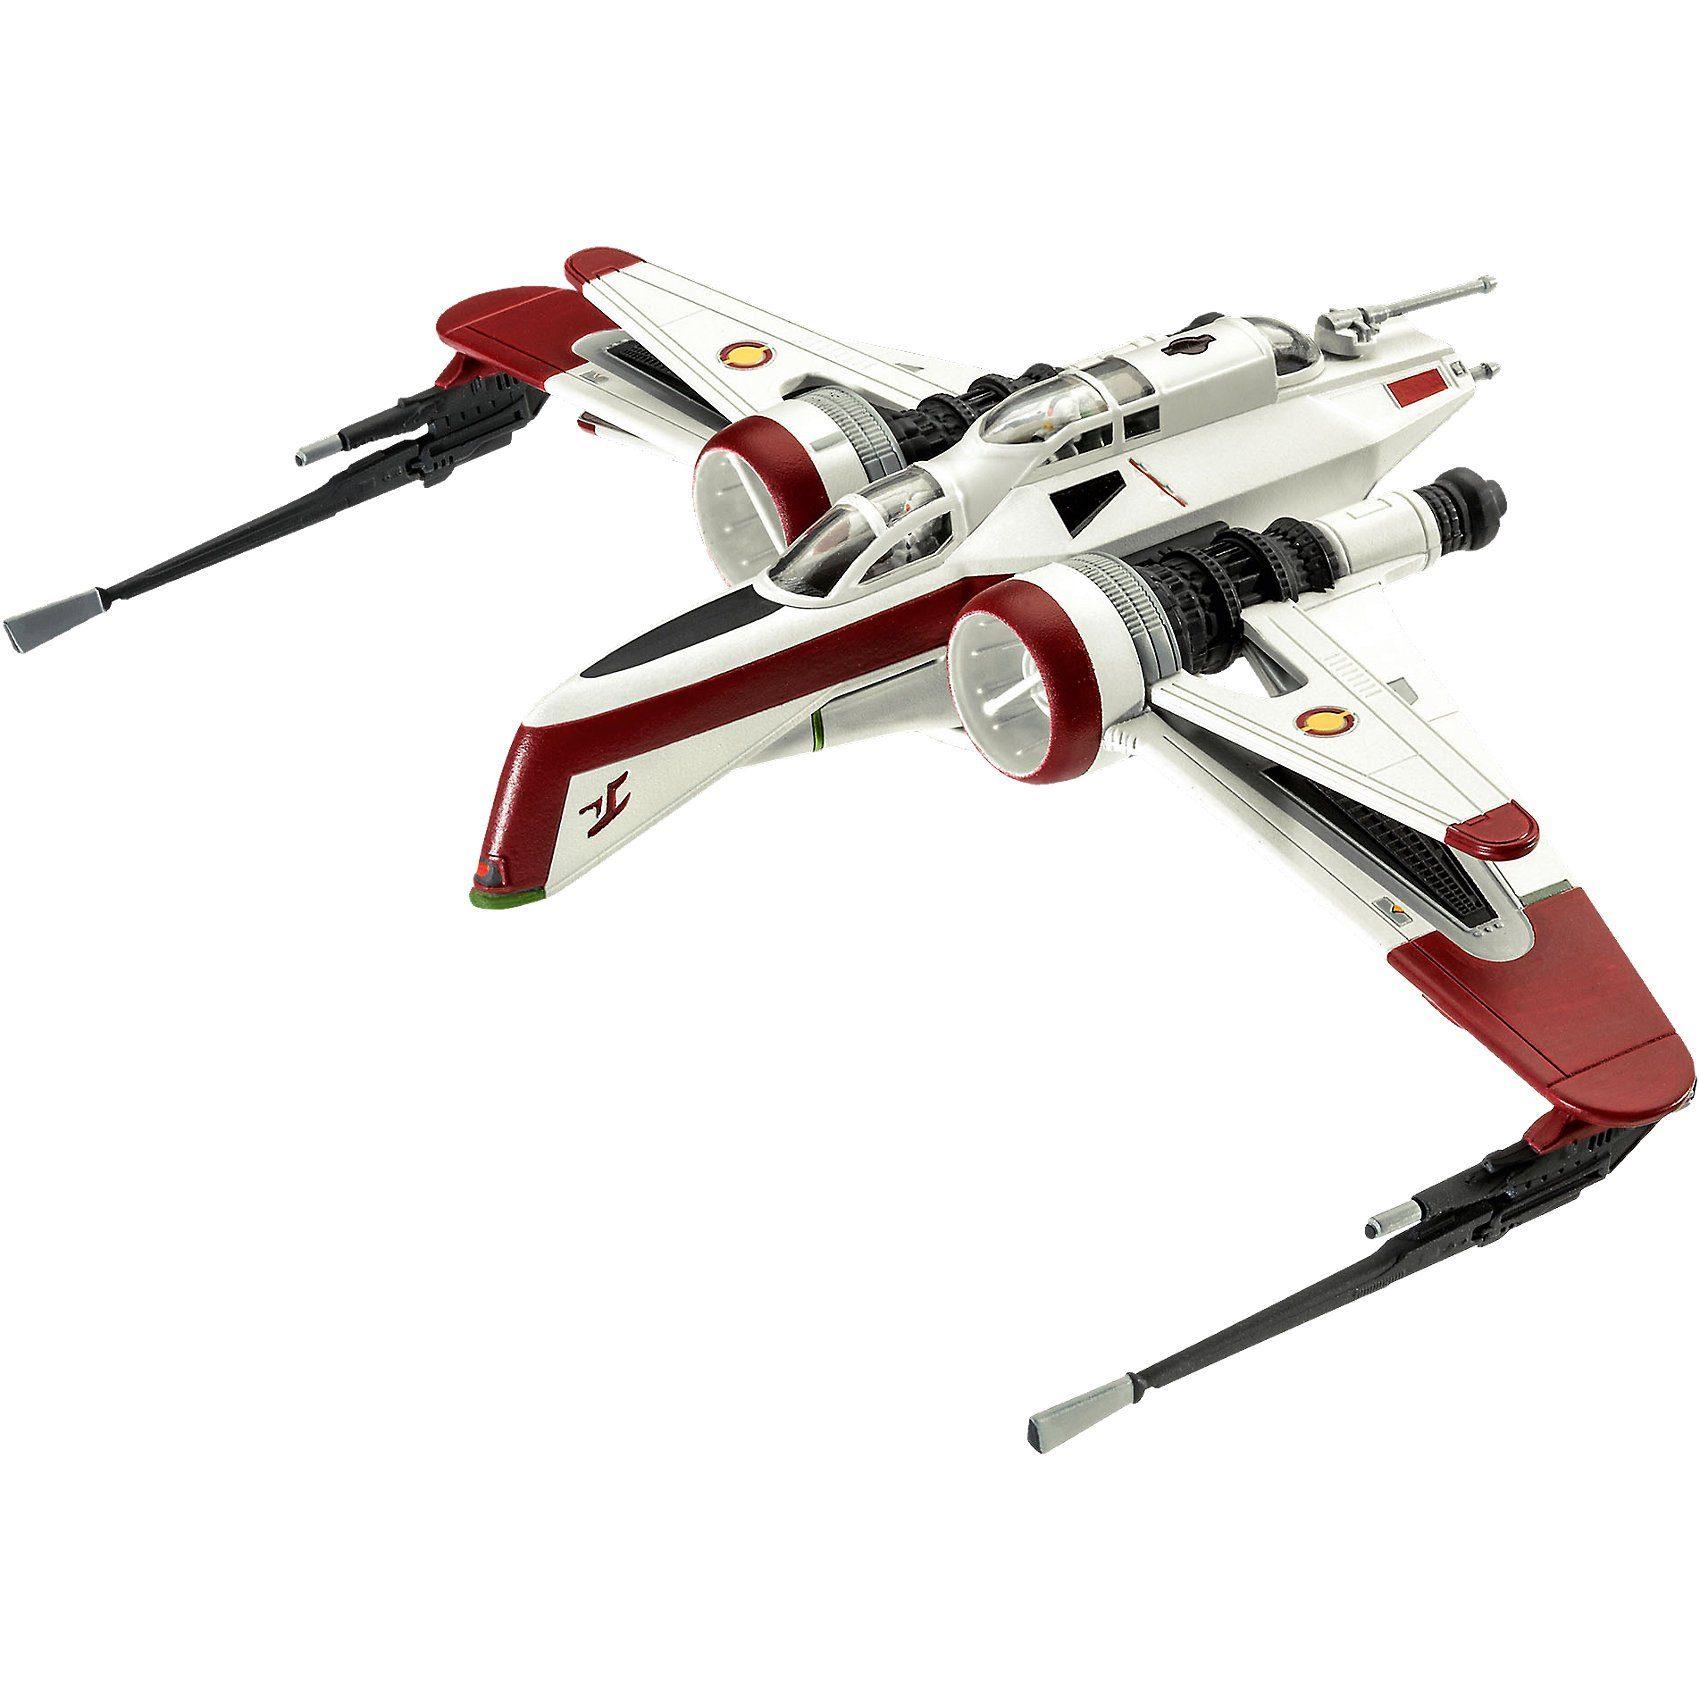 Revell Modellbausatz Star Wars ARC-170 Fighter